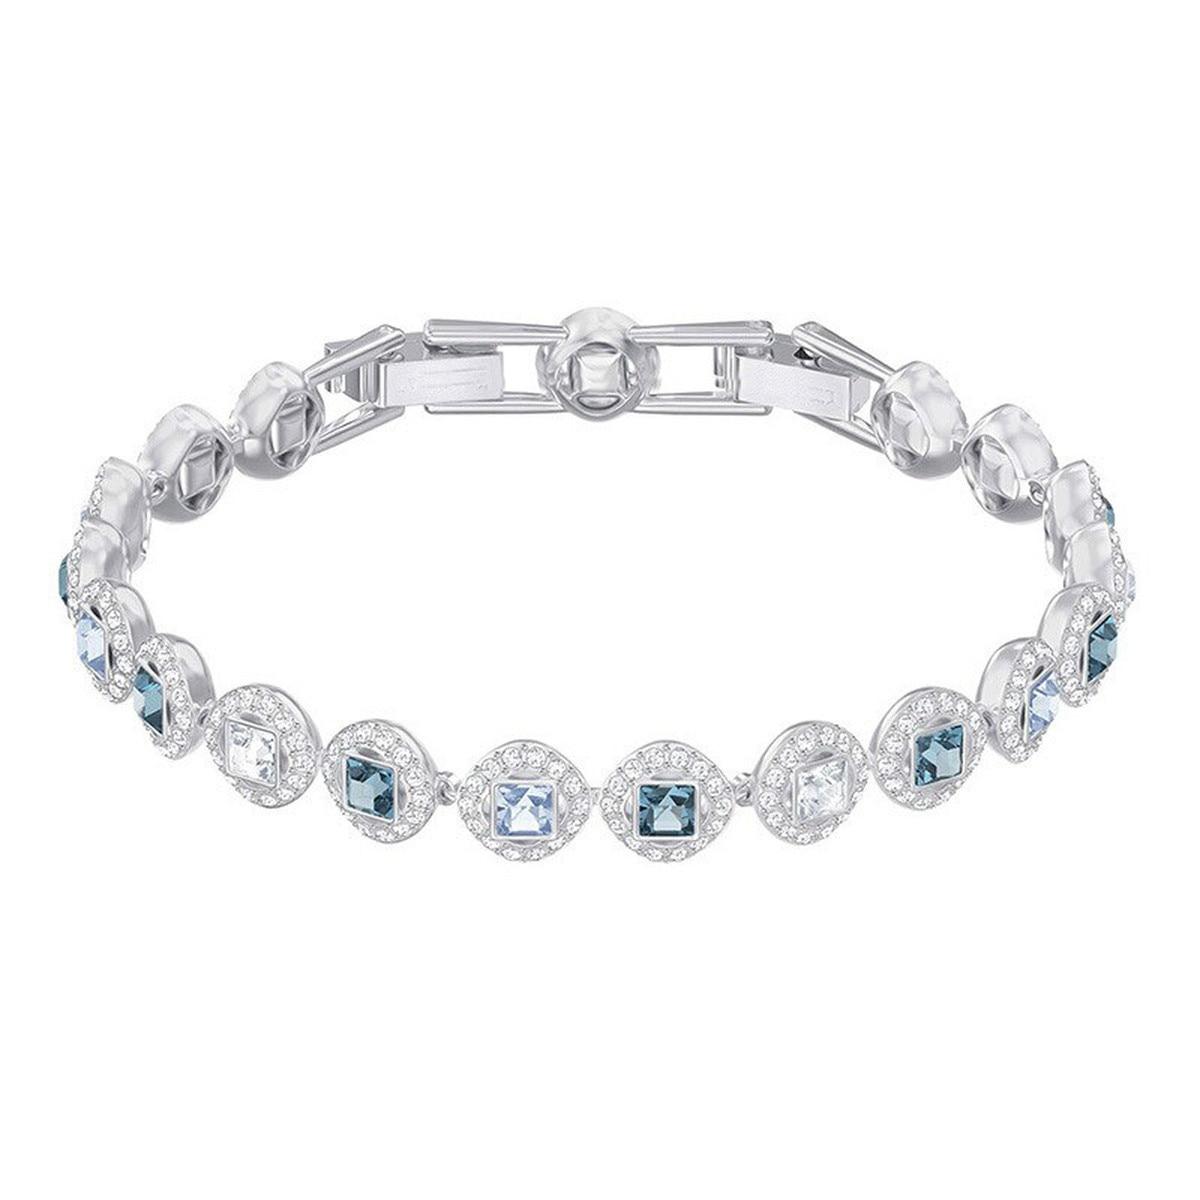 ERIN  High quality SWA fashion women's single row round Bracelet